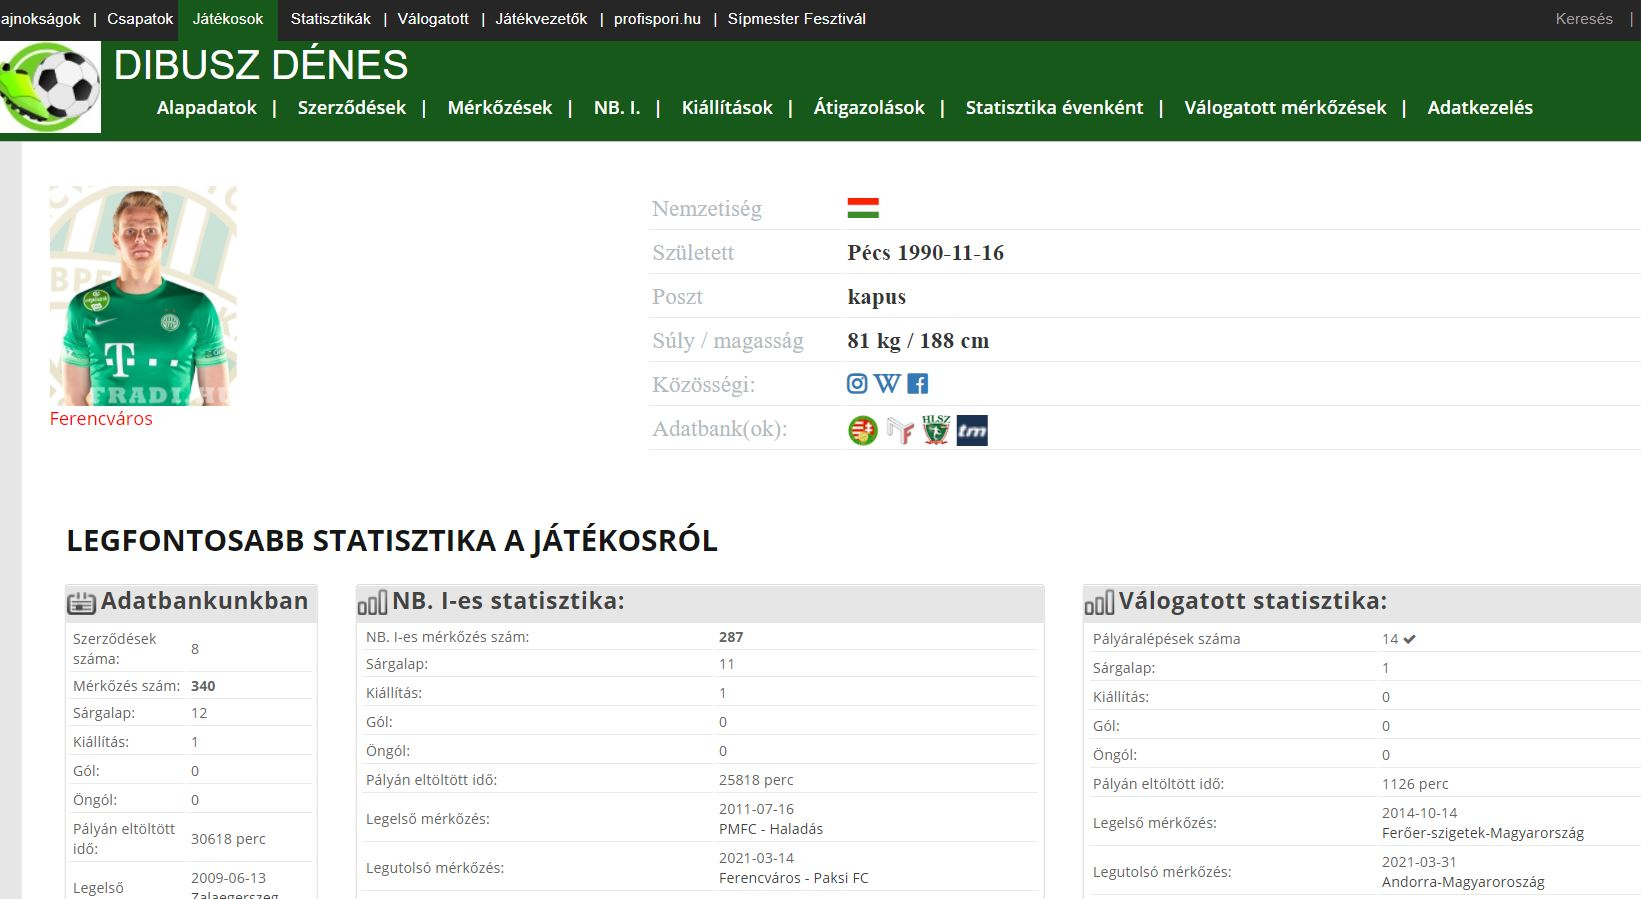 foci-info.hu (2021-04-03) - forrás: foci-info.hu